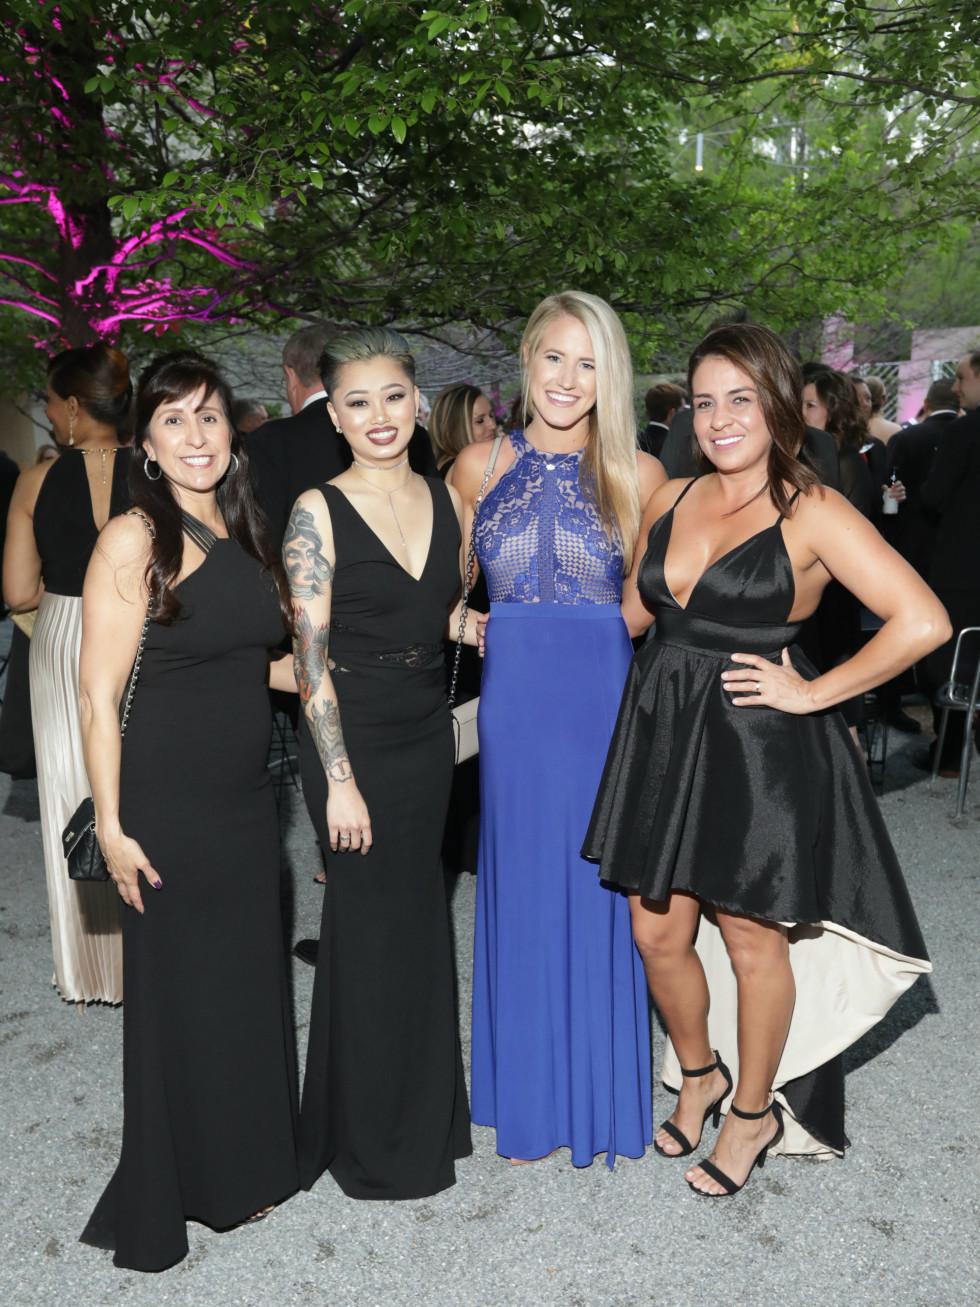 Lori Leatherwood, Diana Chansombat, Sarie Morrison, Claudia Torres